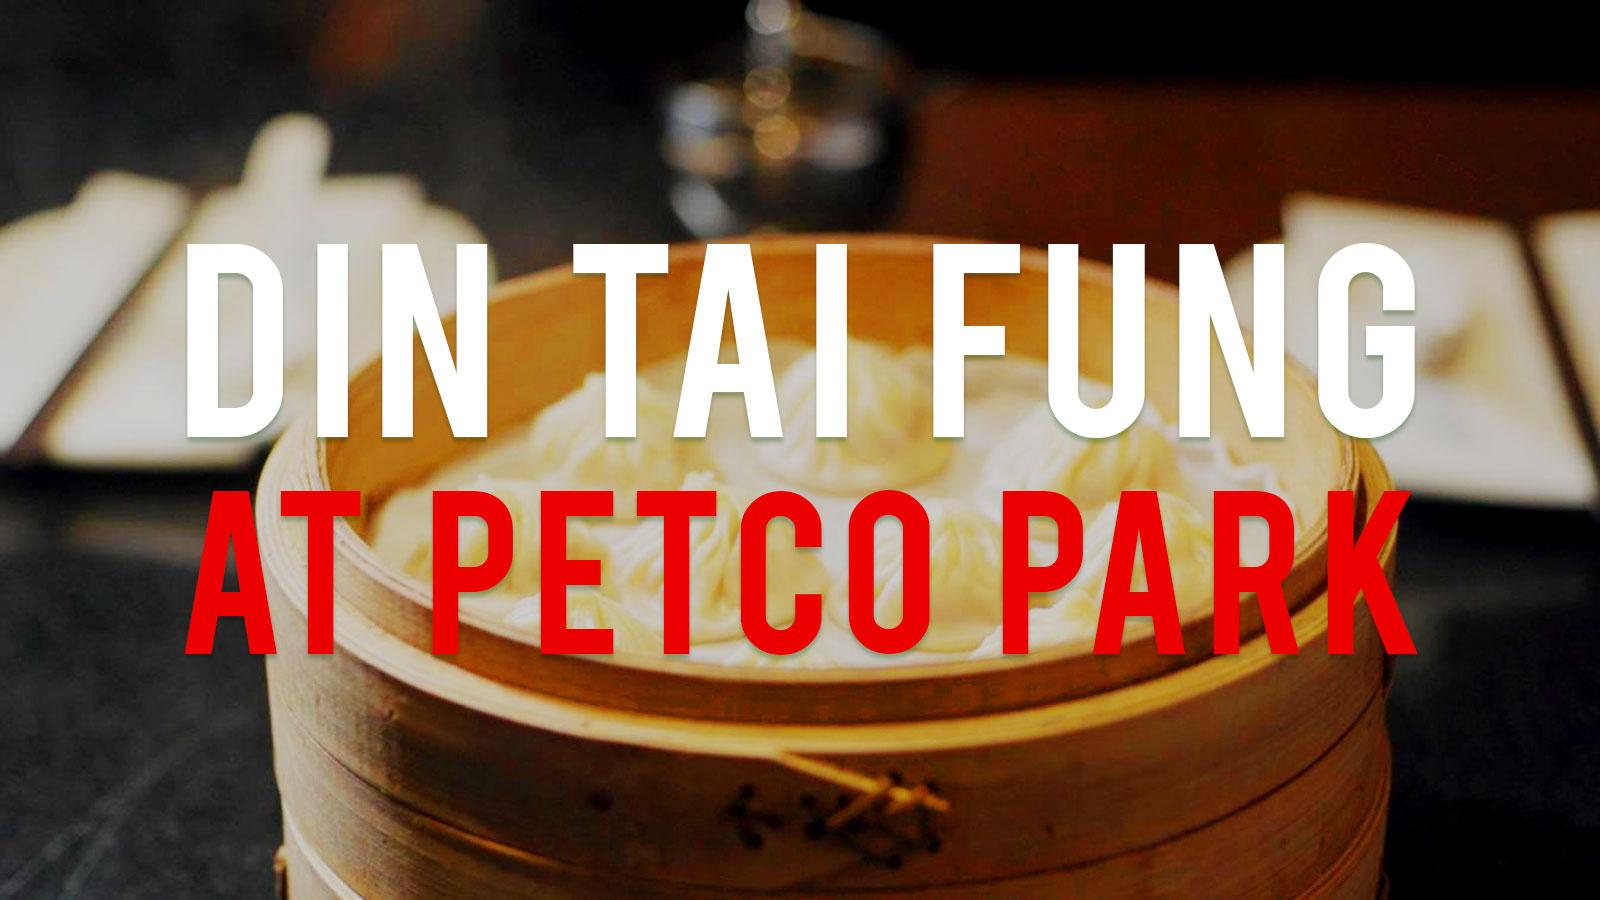 Din Tai Fung at Petco Park